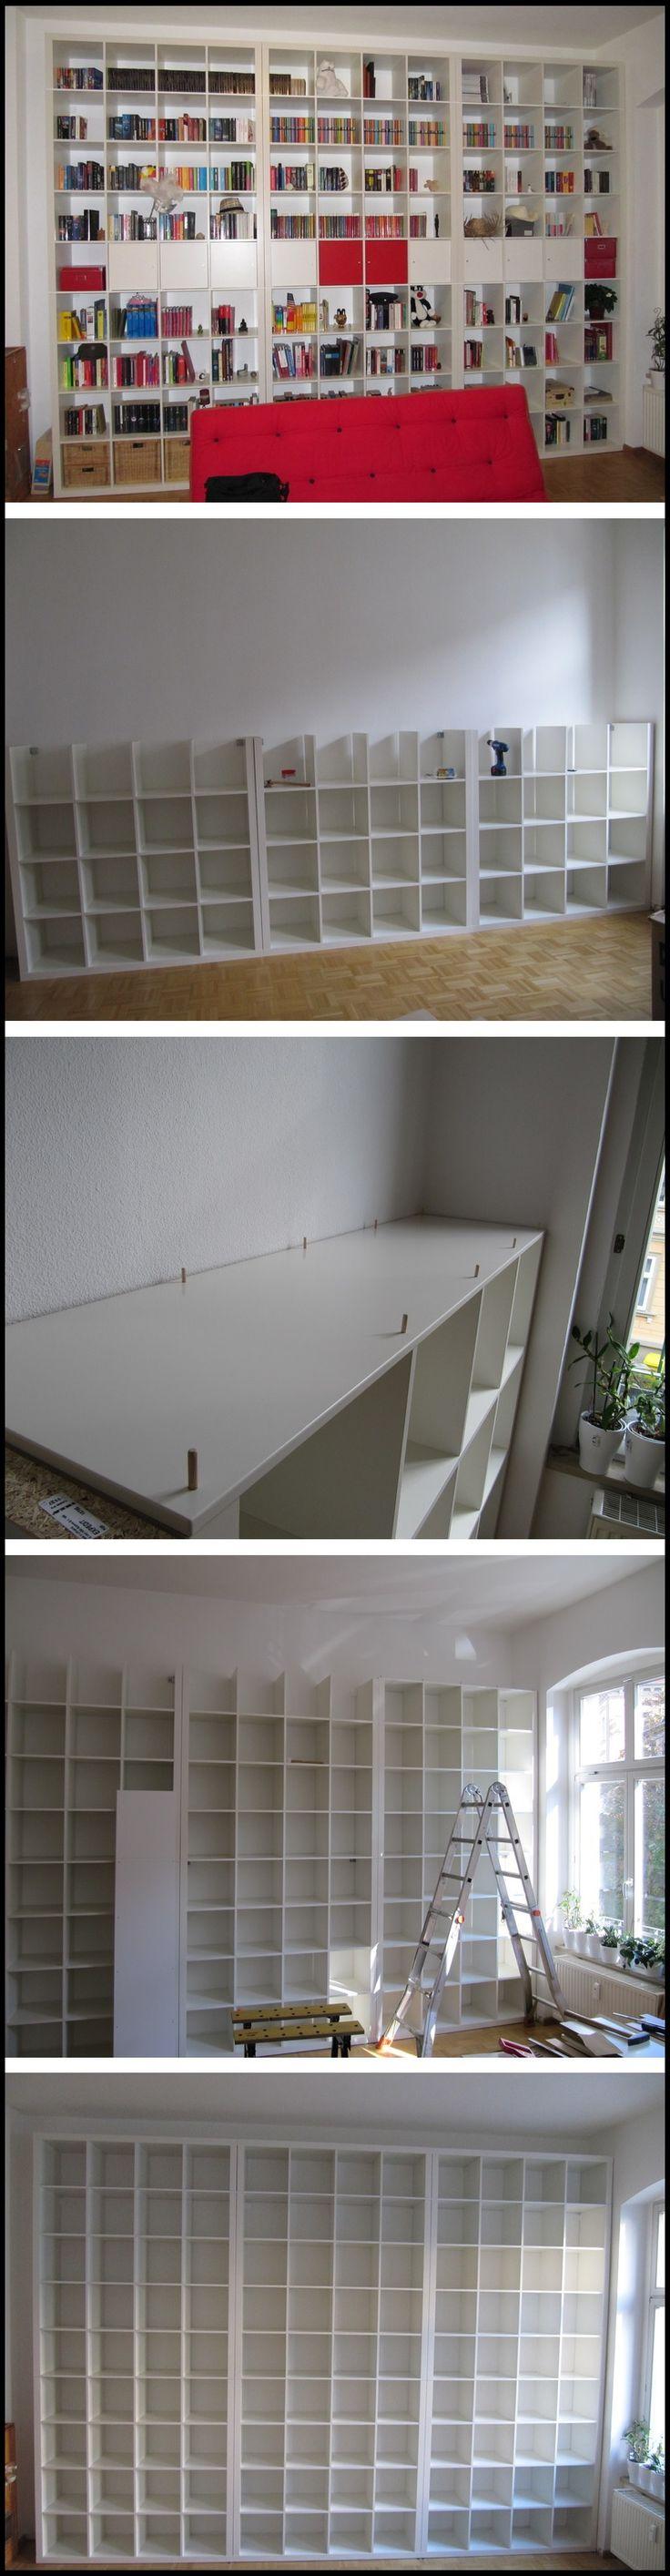 228 best images about ikea expedit kallax hacks on pinterest shelves craft cabinet and ikea. Black Bedroom Furniture Sets. Home Design Ideas